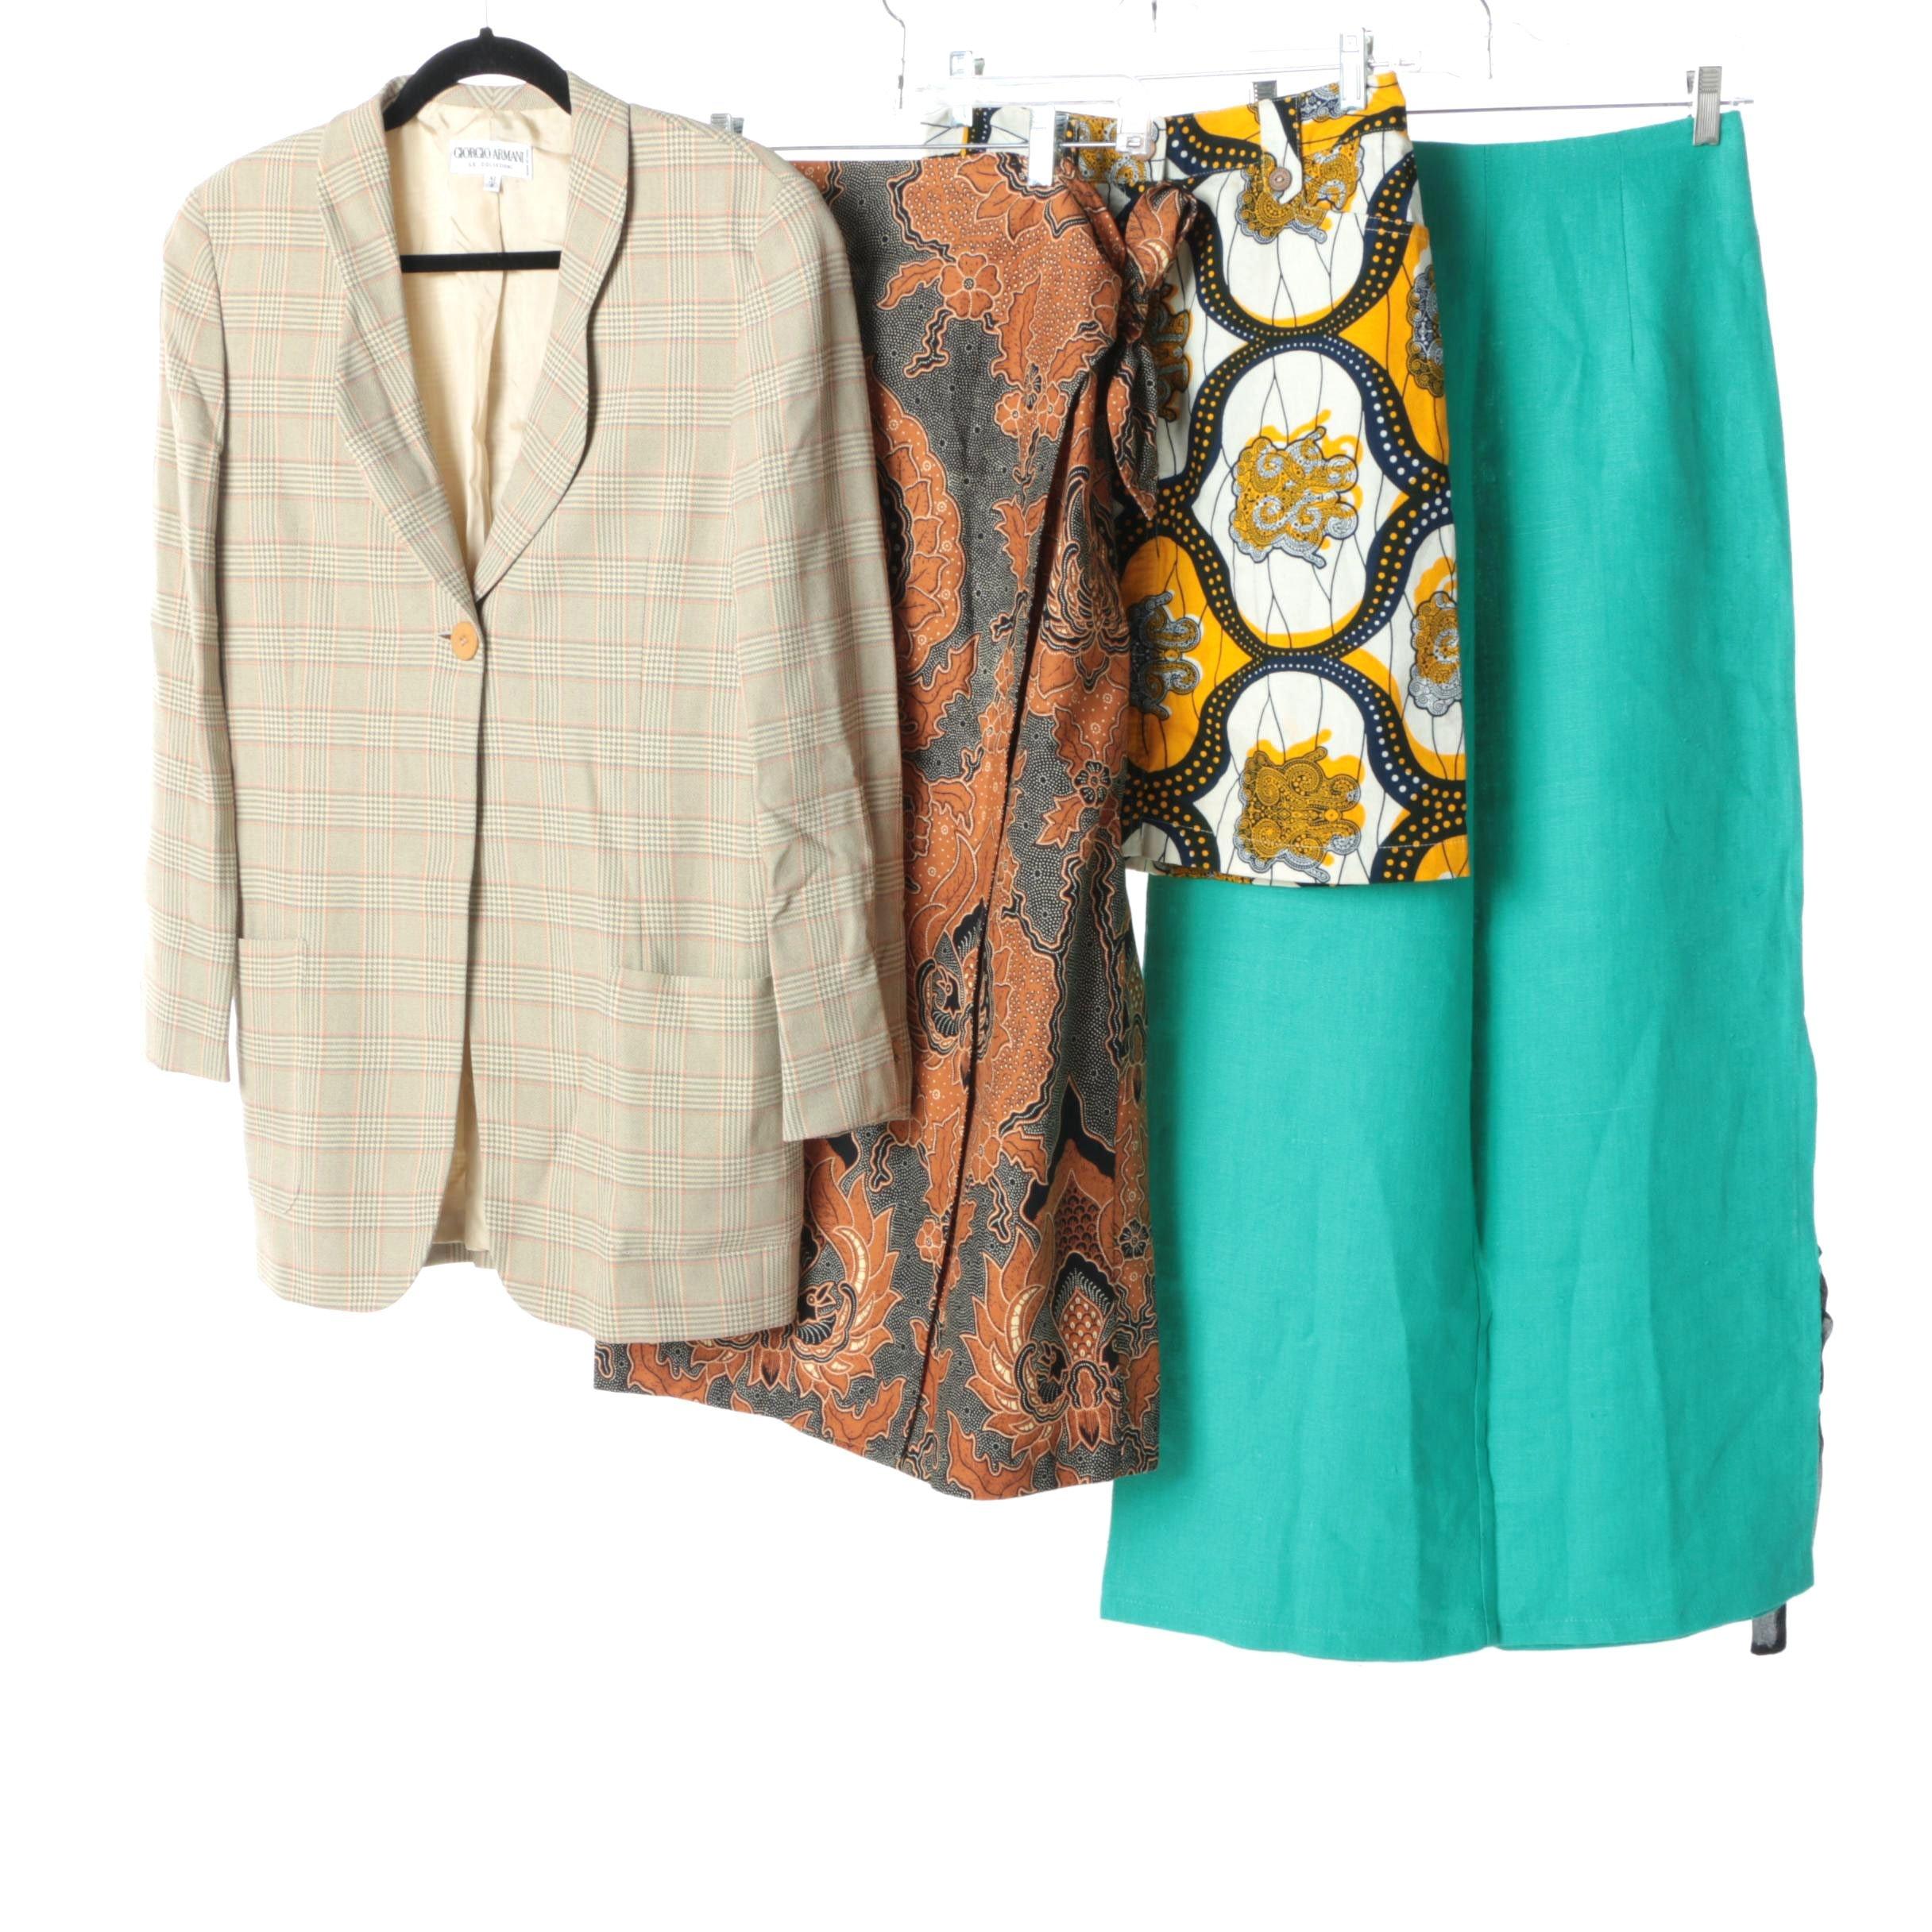 Women's Clothing Including Giorgio Armani Le Collezioni and J. McLaughlin